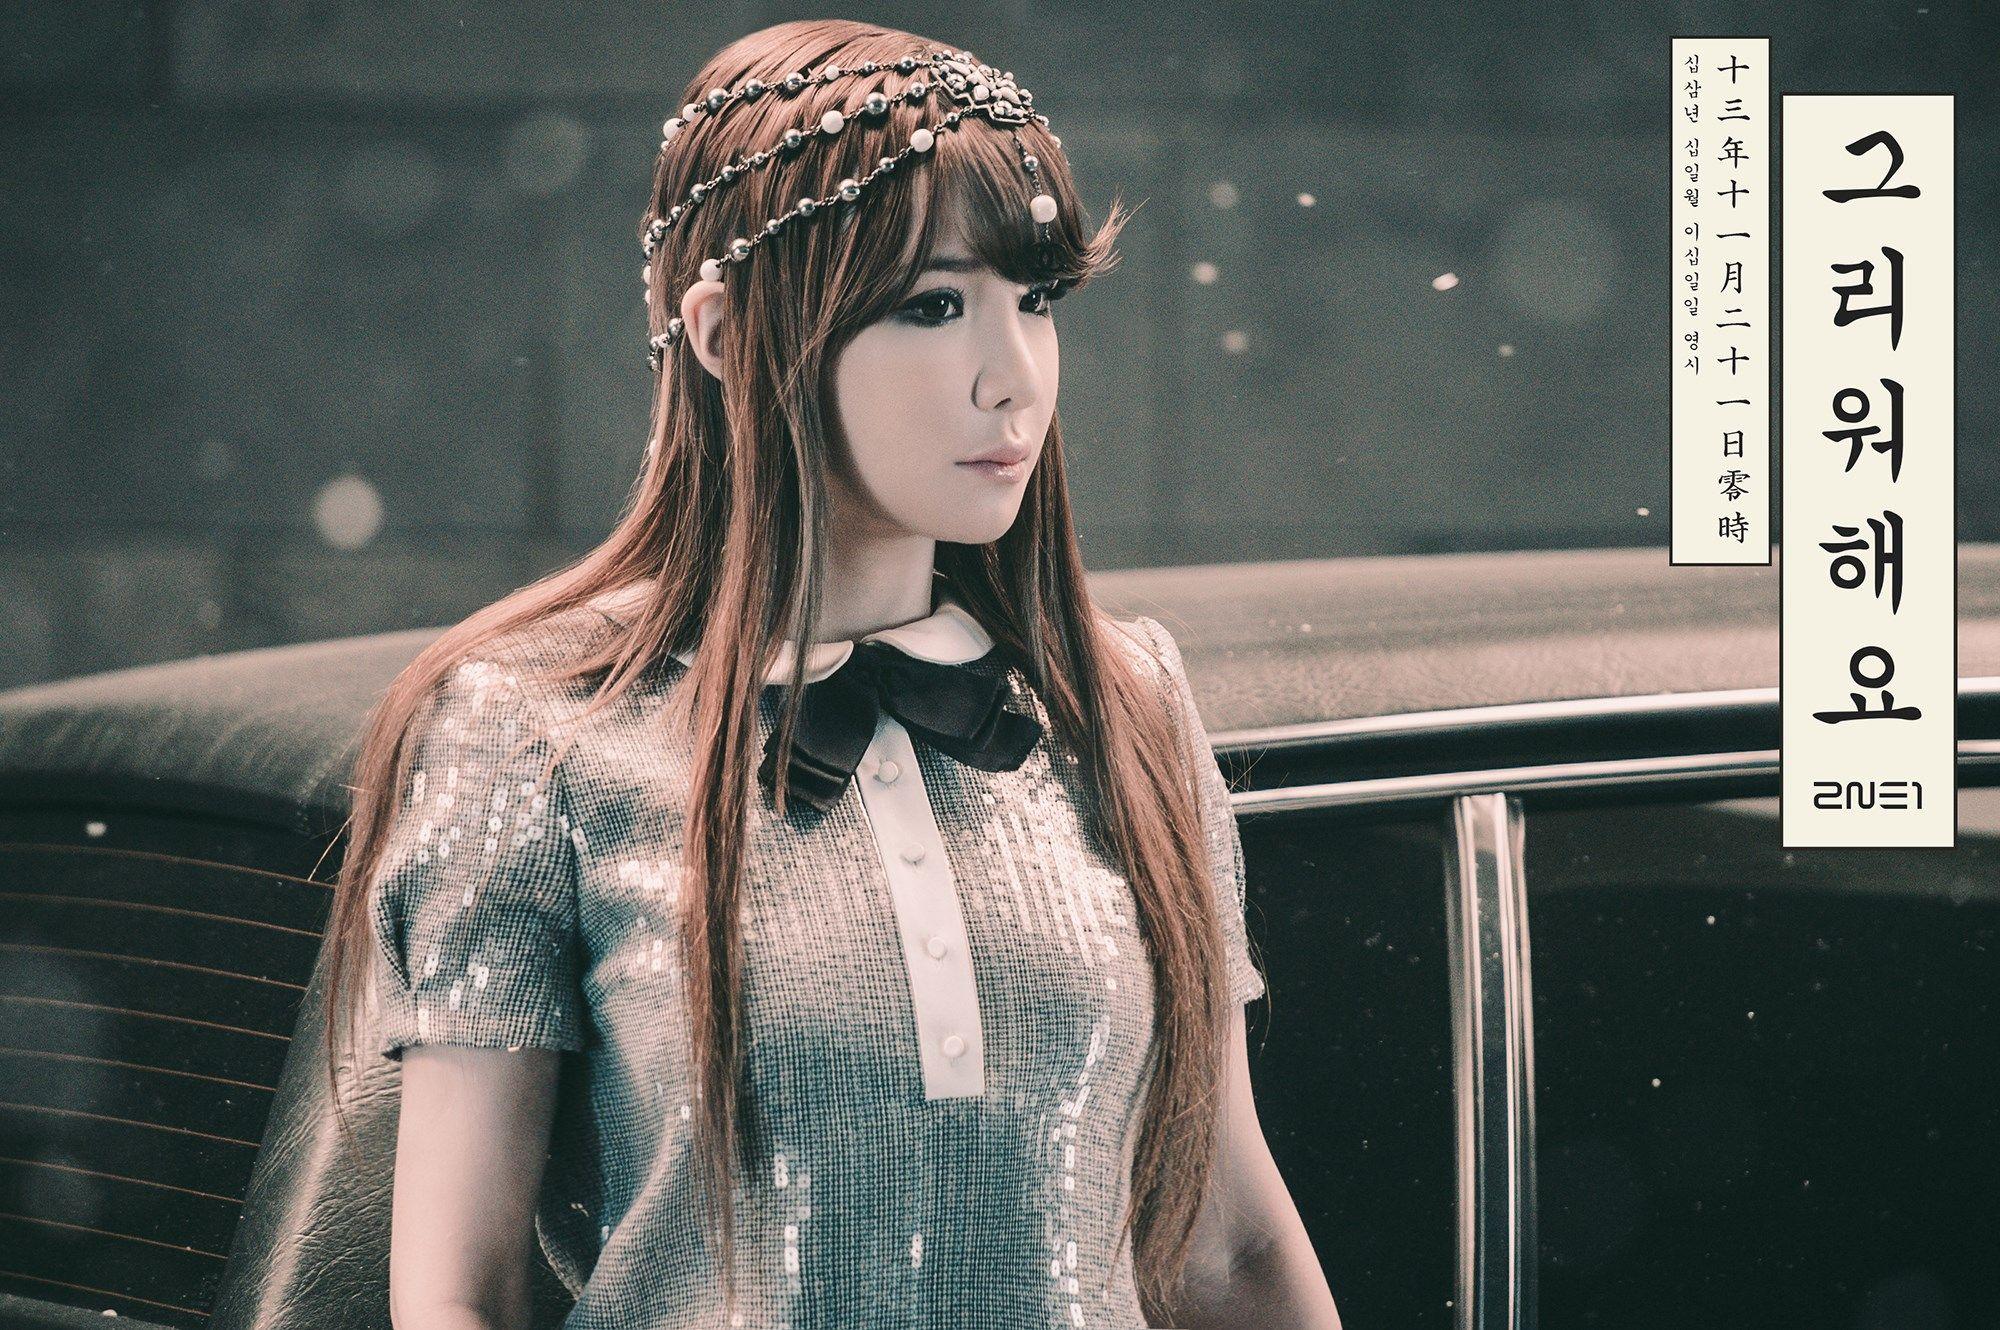 2NE1 - MISSING YOU (그리워해요) - BOM by. YG ENTERTAINMENT